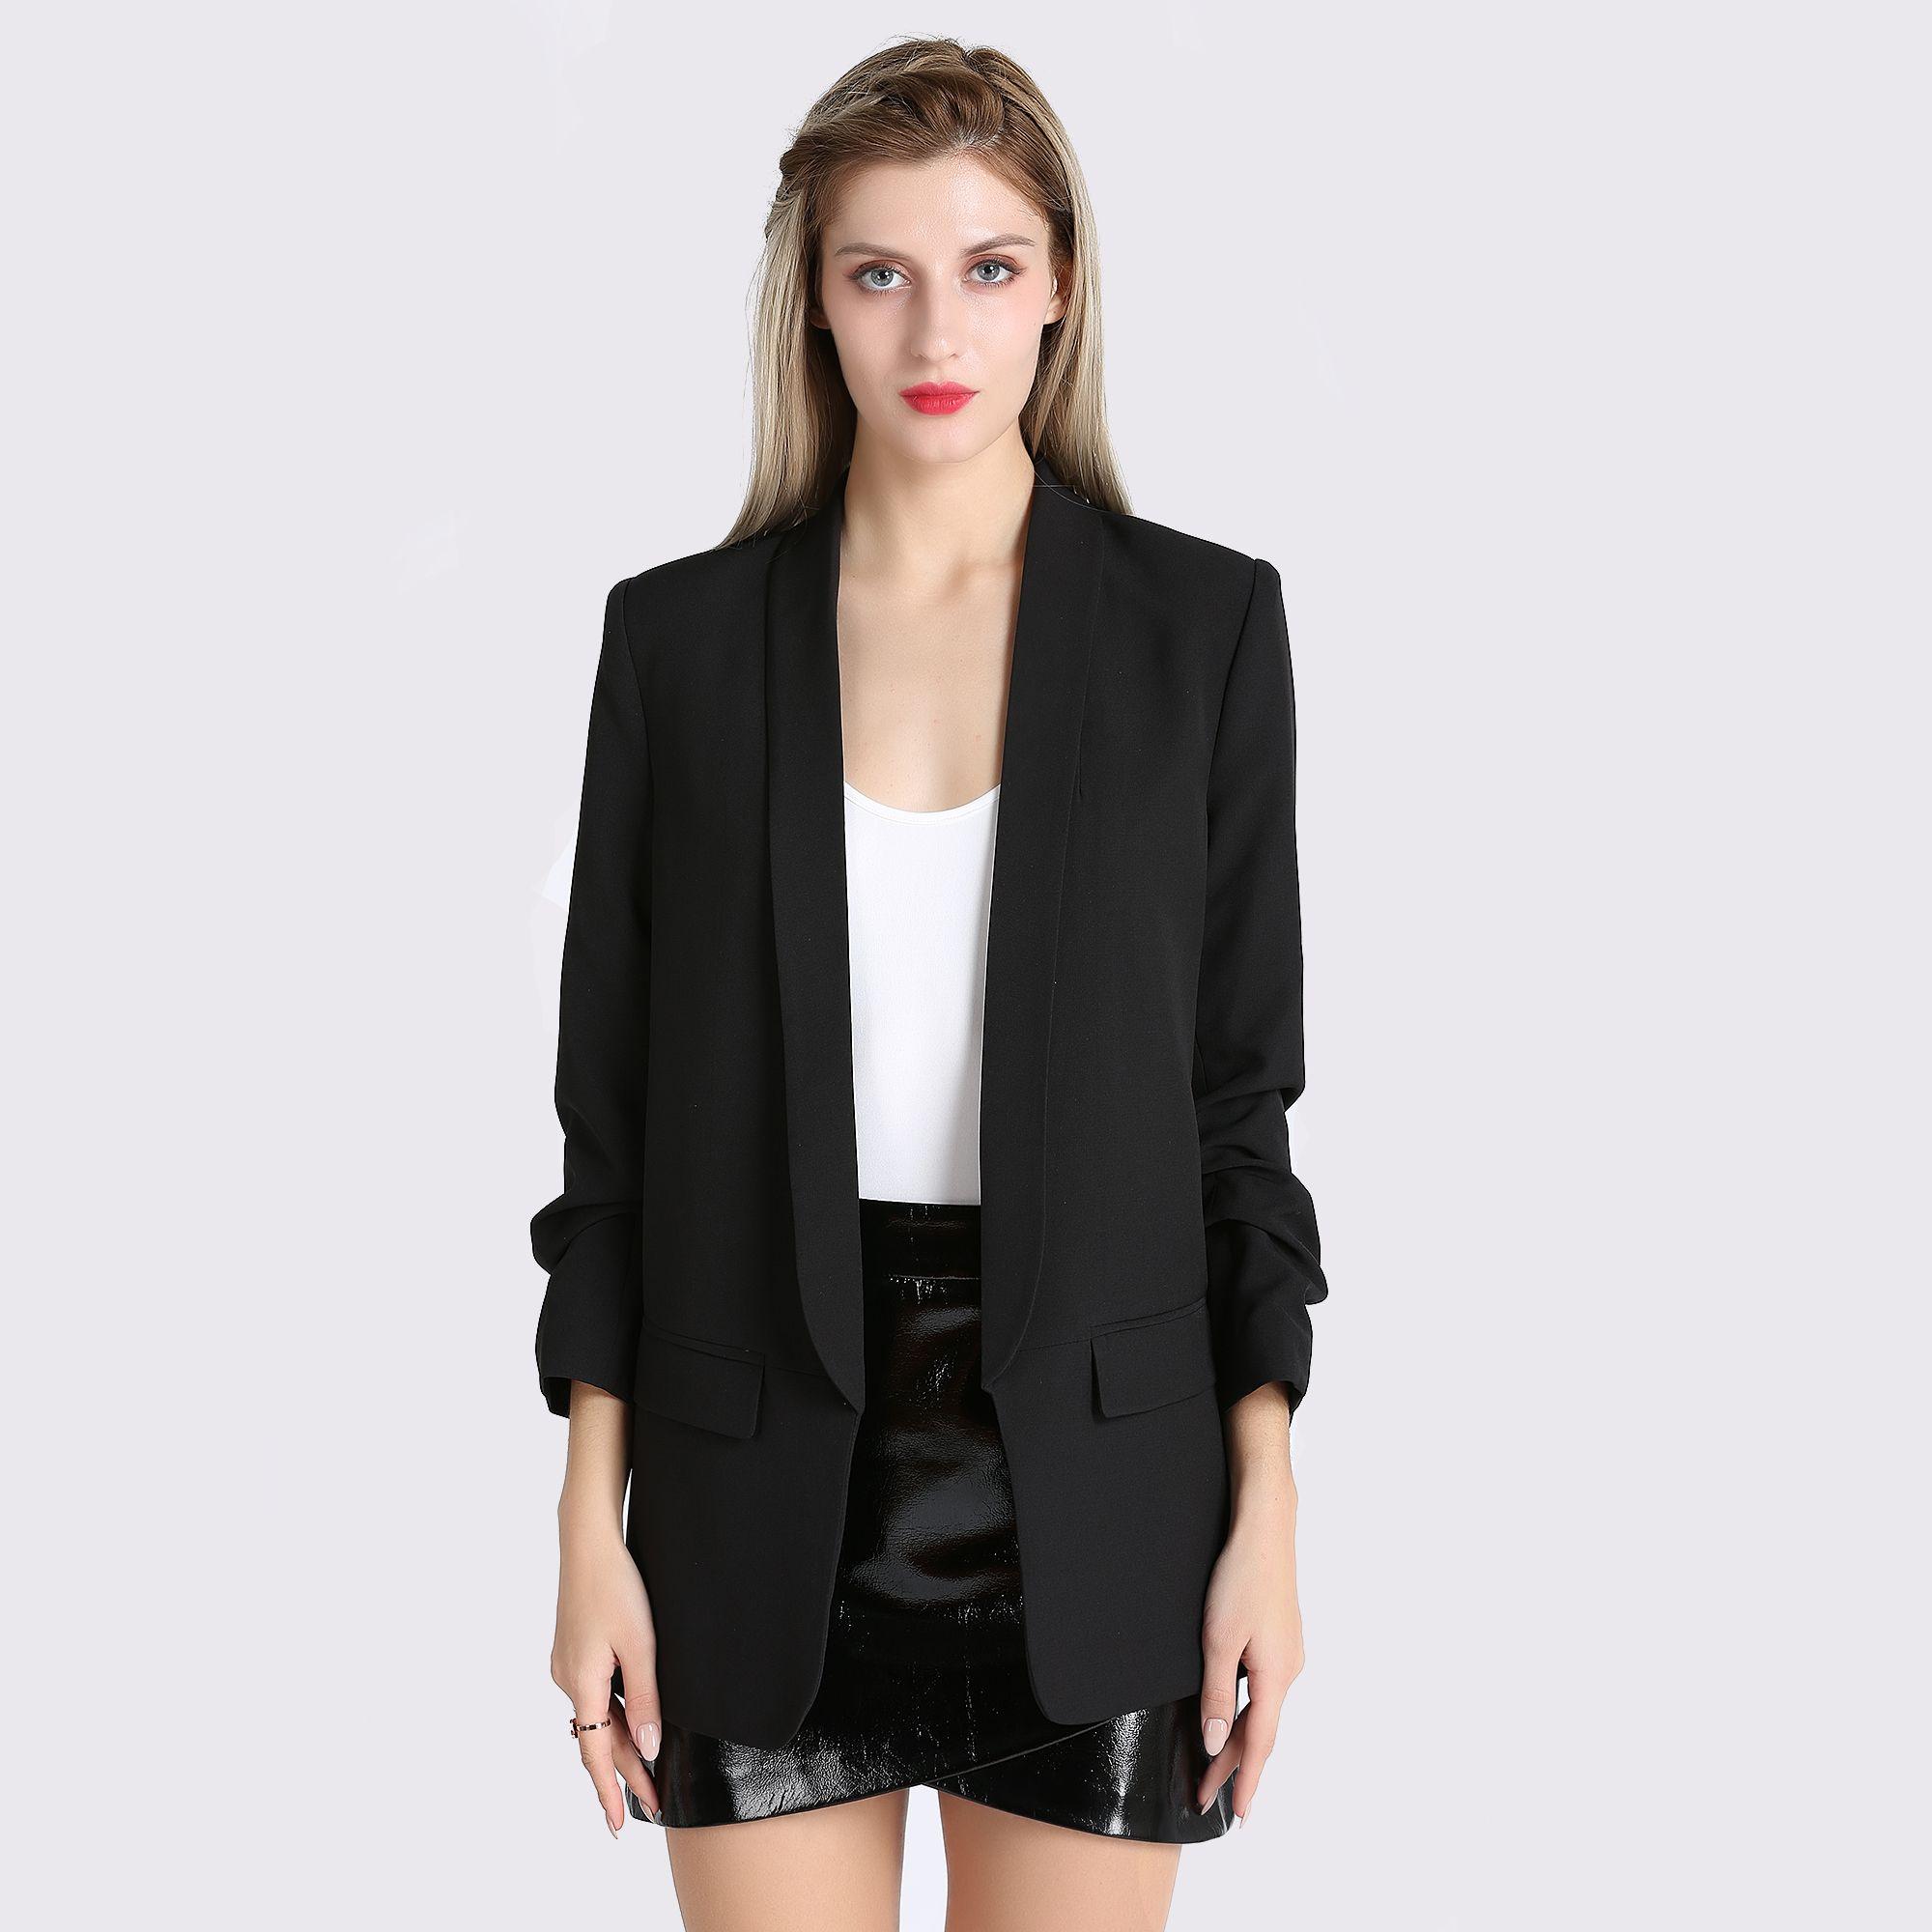 17a346e117 Fashion Autumn Women Blazers and Jackets Work Office Lady Suit Slim White  Black None Button Business female blazer Coat Zevrez  Women  Beauty   Fashion ...